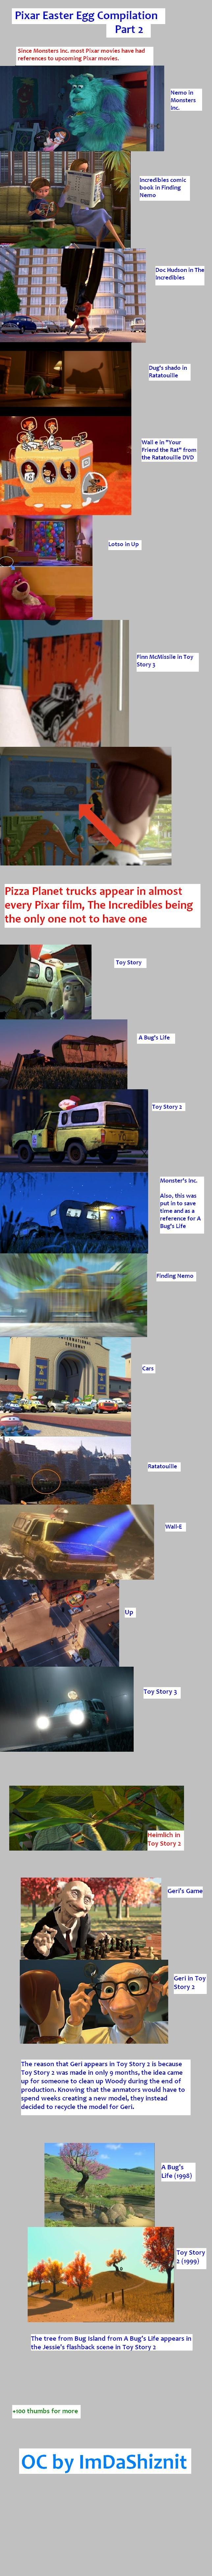 Pixar Easter Egg Comp. Part 2. Part 1: /funny_pictures/2562135/Another+stone... Part 3: /funny_pictures/2564722/Pixar+Easter+.... Pixar Easter Egg Compilation P pixar Easter egg Disney hidden cool